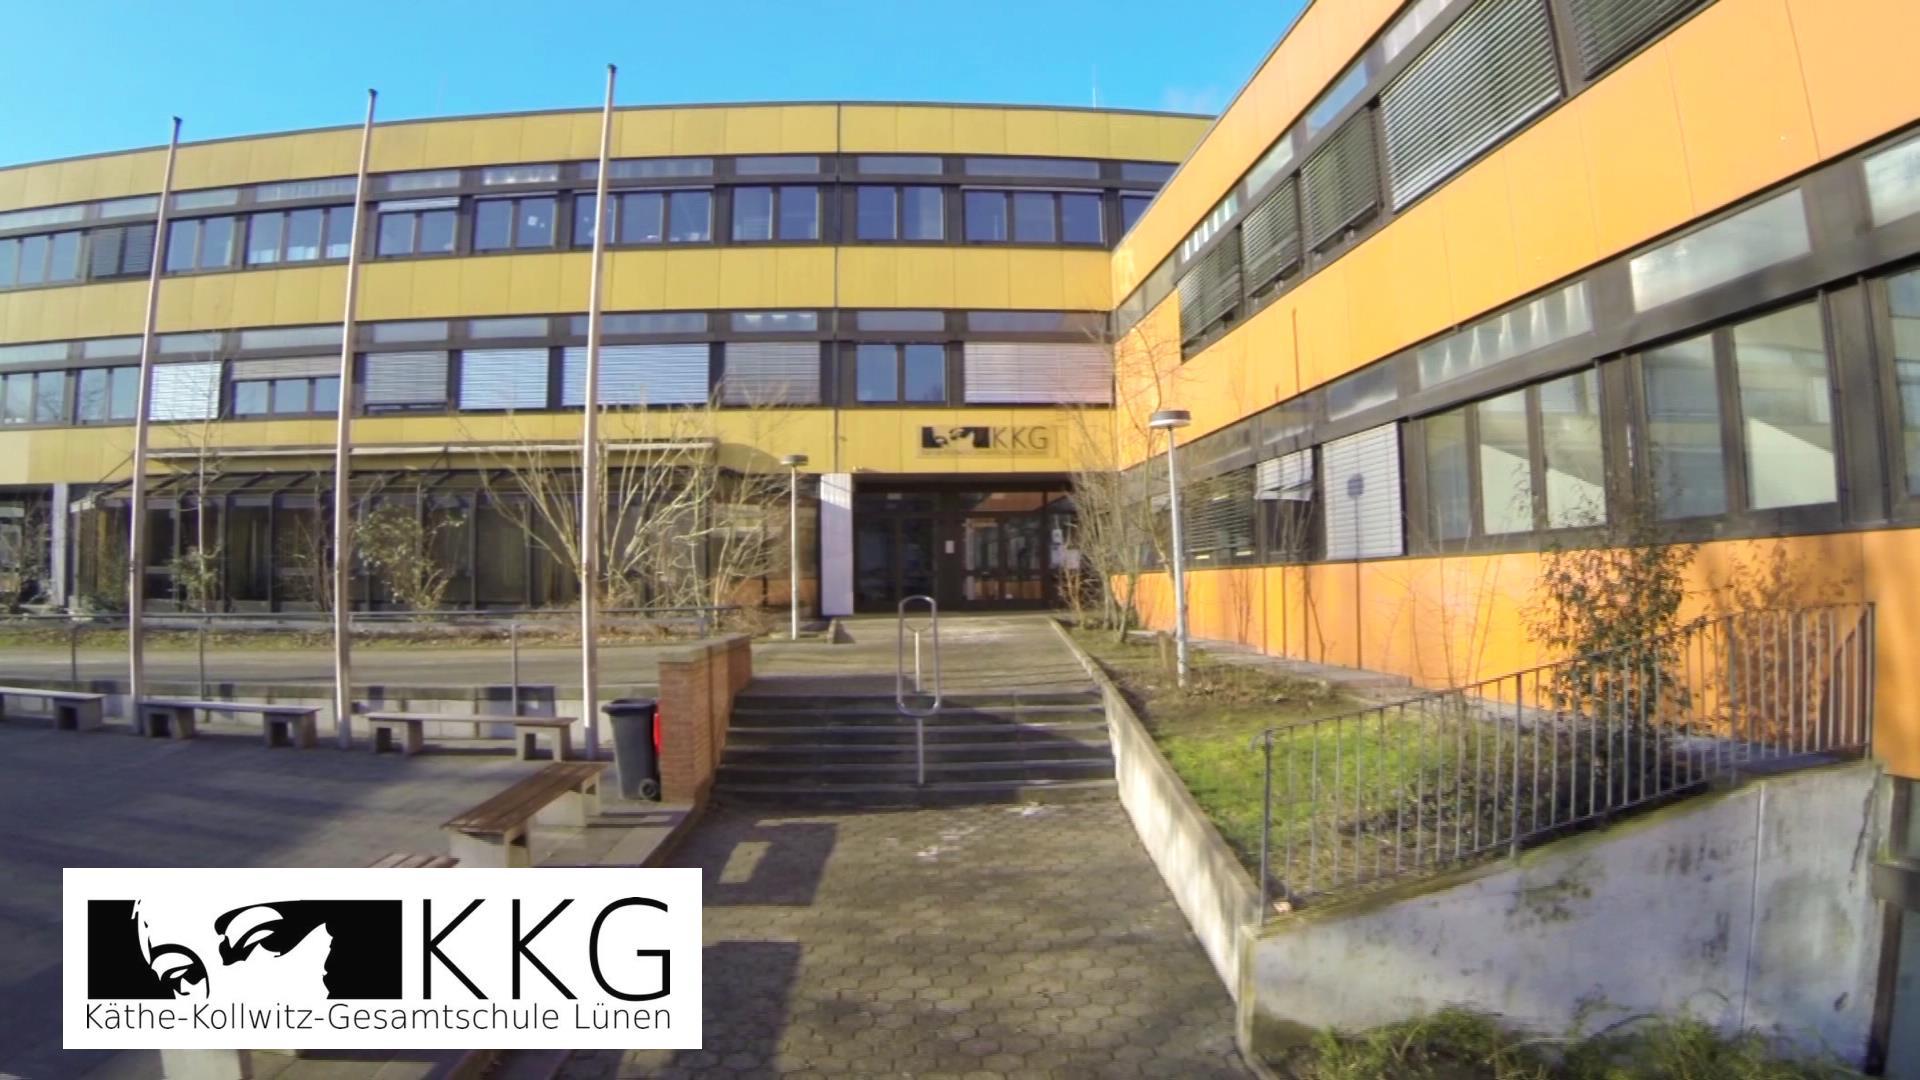 Die Käthe-Kollwitz-Gesamtschule Lünen – Nov. 2020